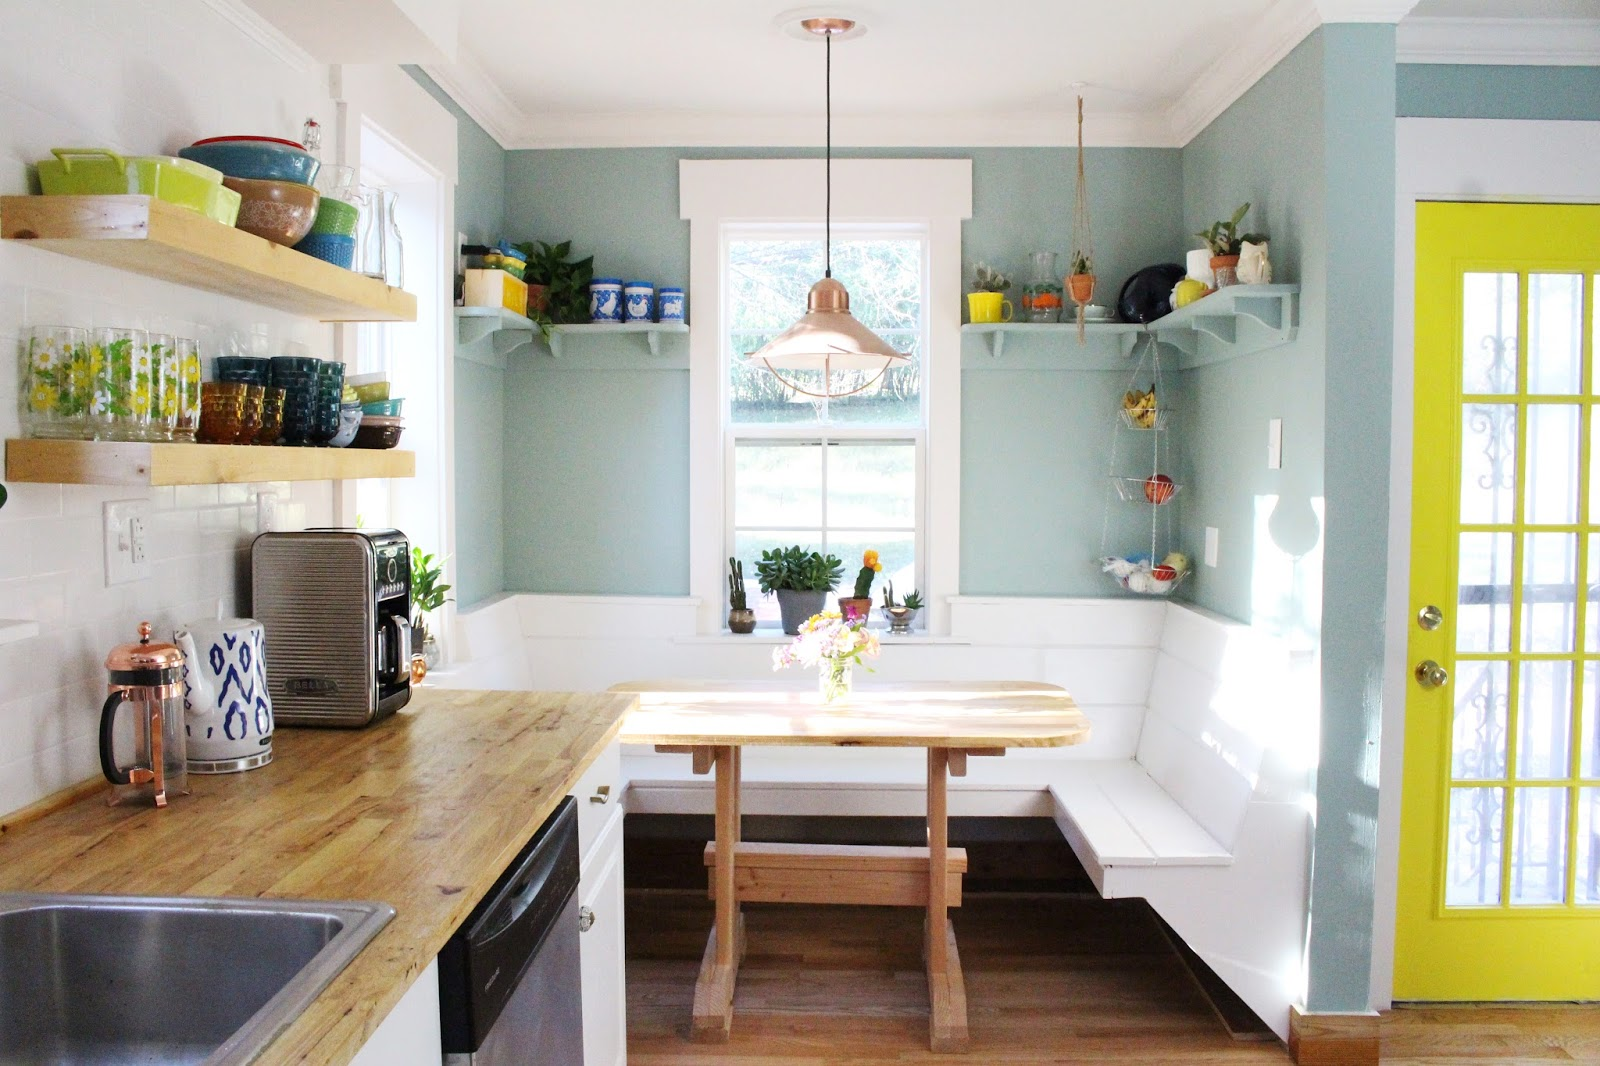 McGavock Manor Kitchen Remodel: VOTE NOW!